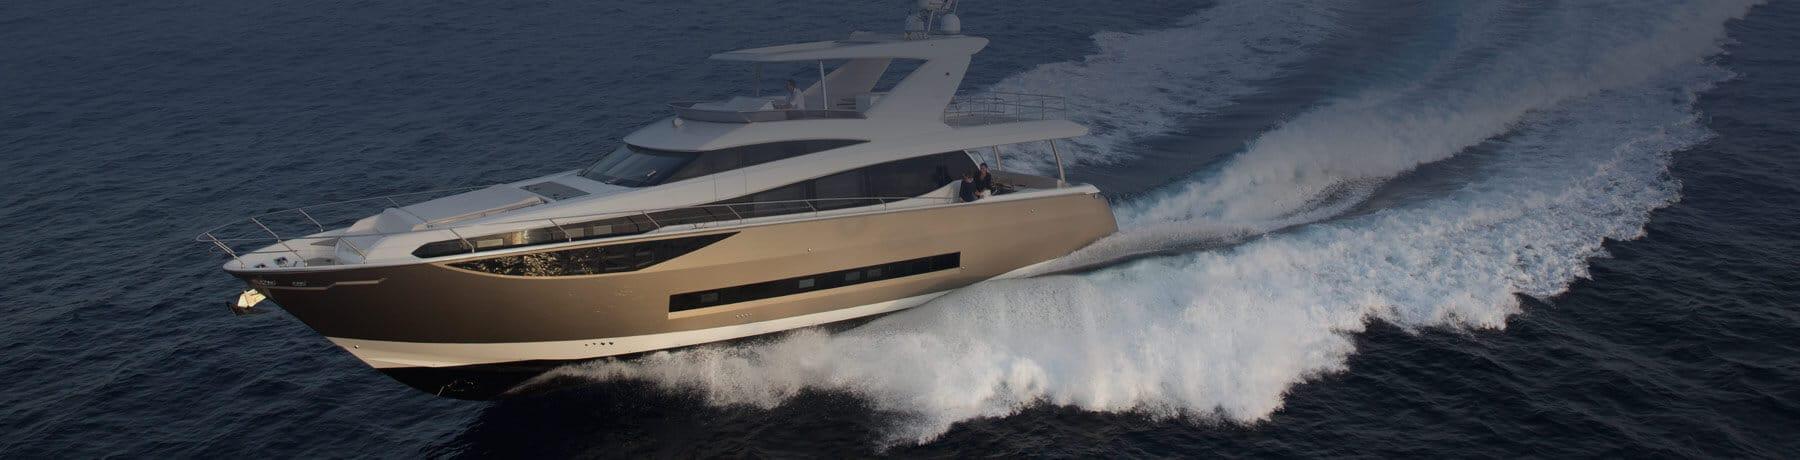 Jeanneau Prestige Yacht Division, Pornichet Yachting